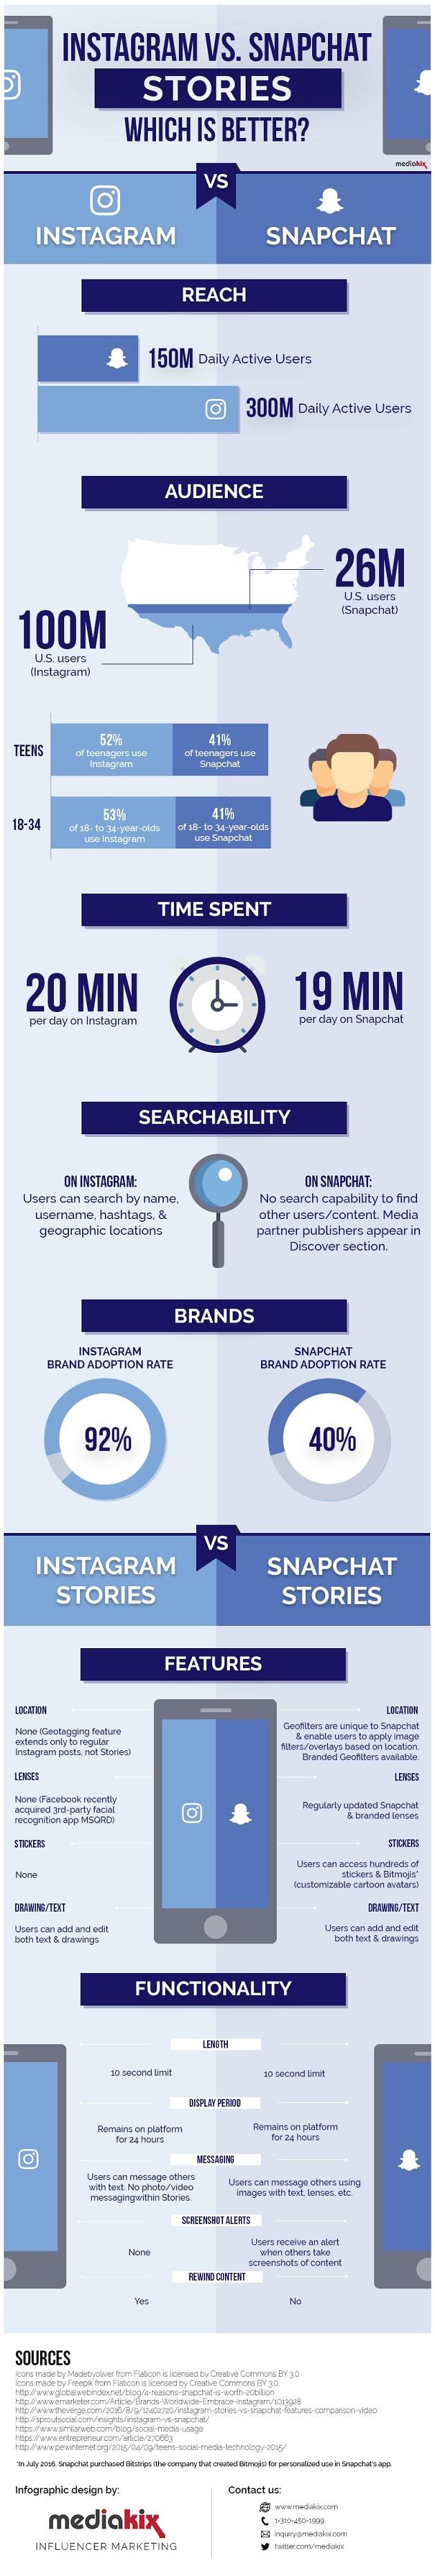 instagram-stories-vs-snapchat-infographic.jpg